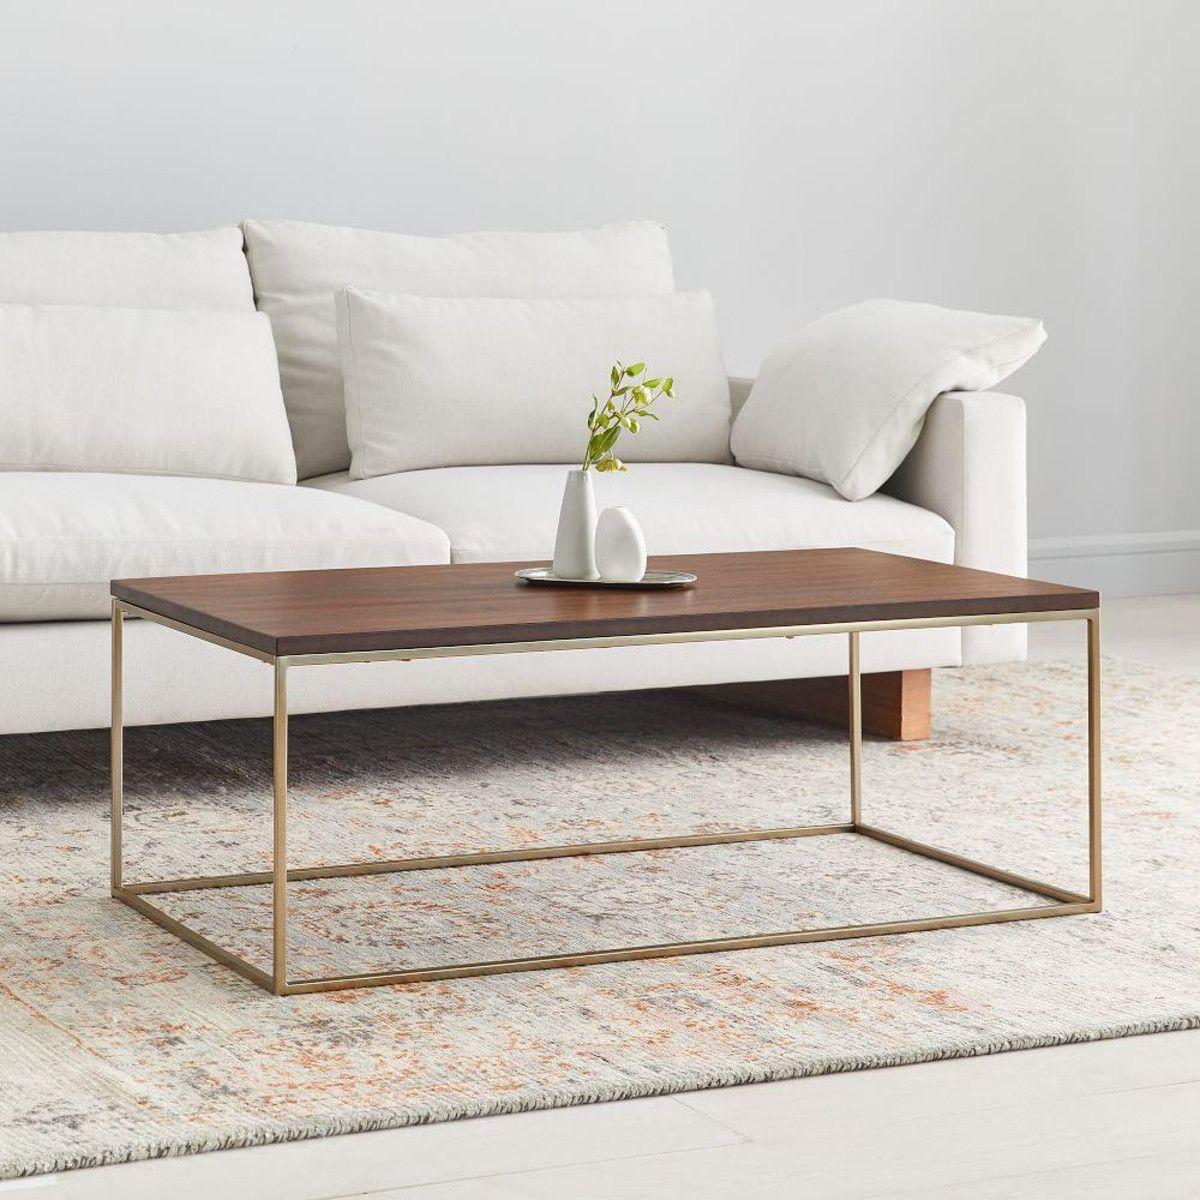 10+ West elm streamline marble coffee table ideas in 2021